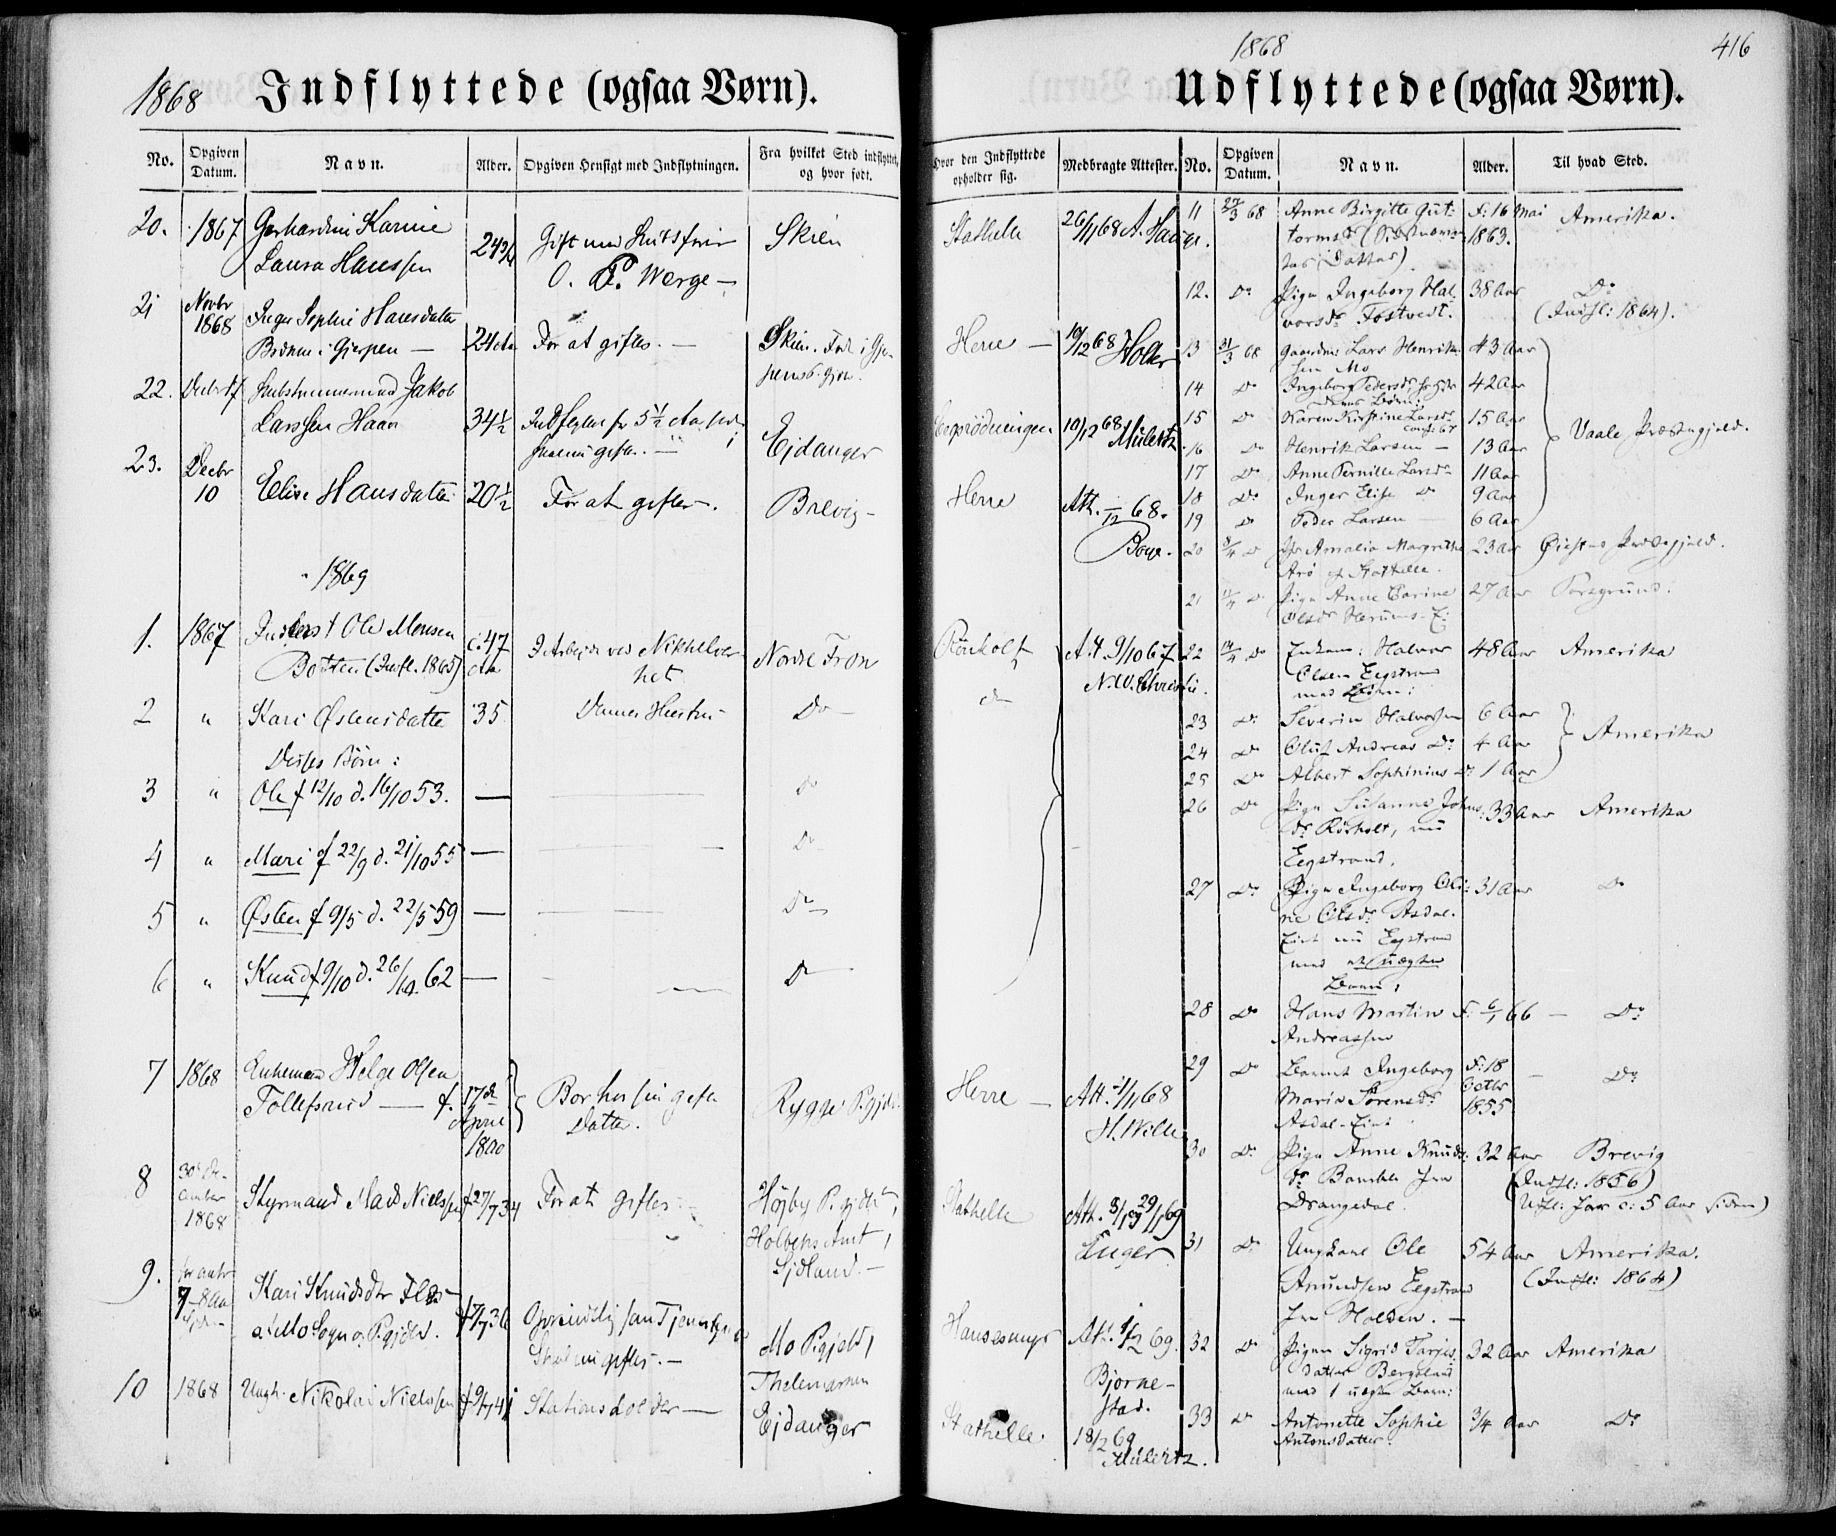 SAKO, Bamble kirkebøker, F/Fa/L0005: Ministerialbok nr. I 5, 1854-1869, s. 416